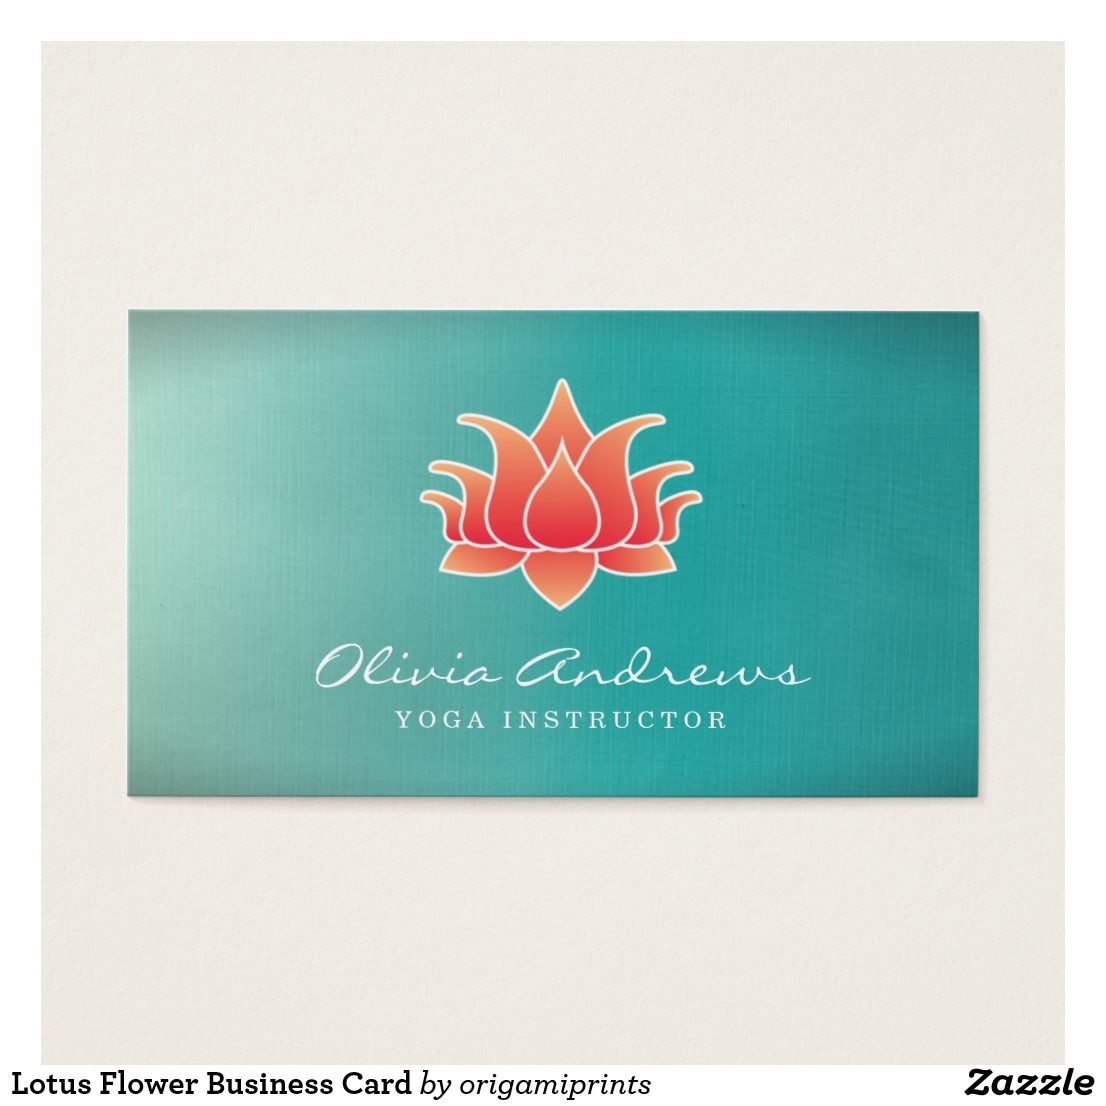 Fine Lotus Flower Business Cards Sketch - Business Card Ideas ...